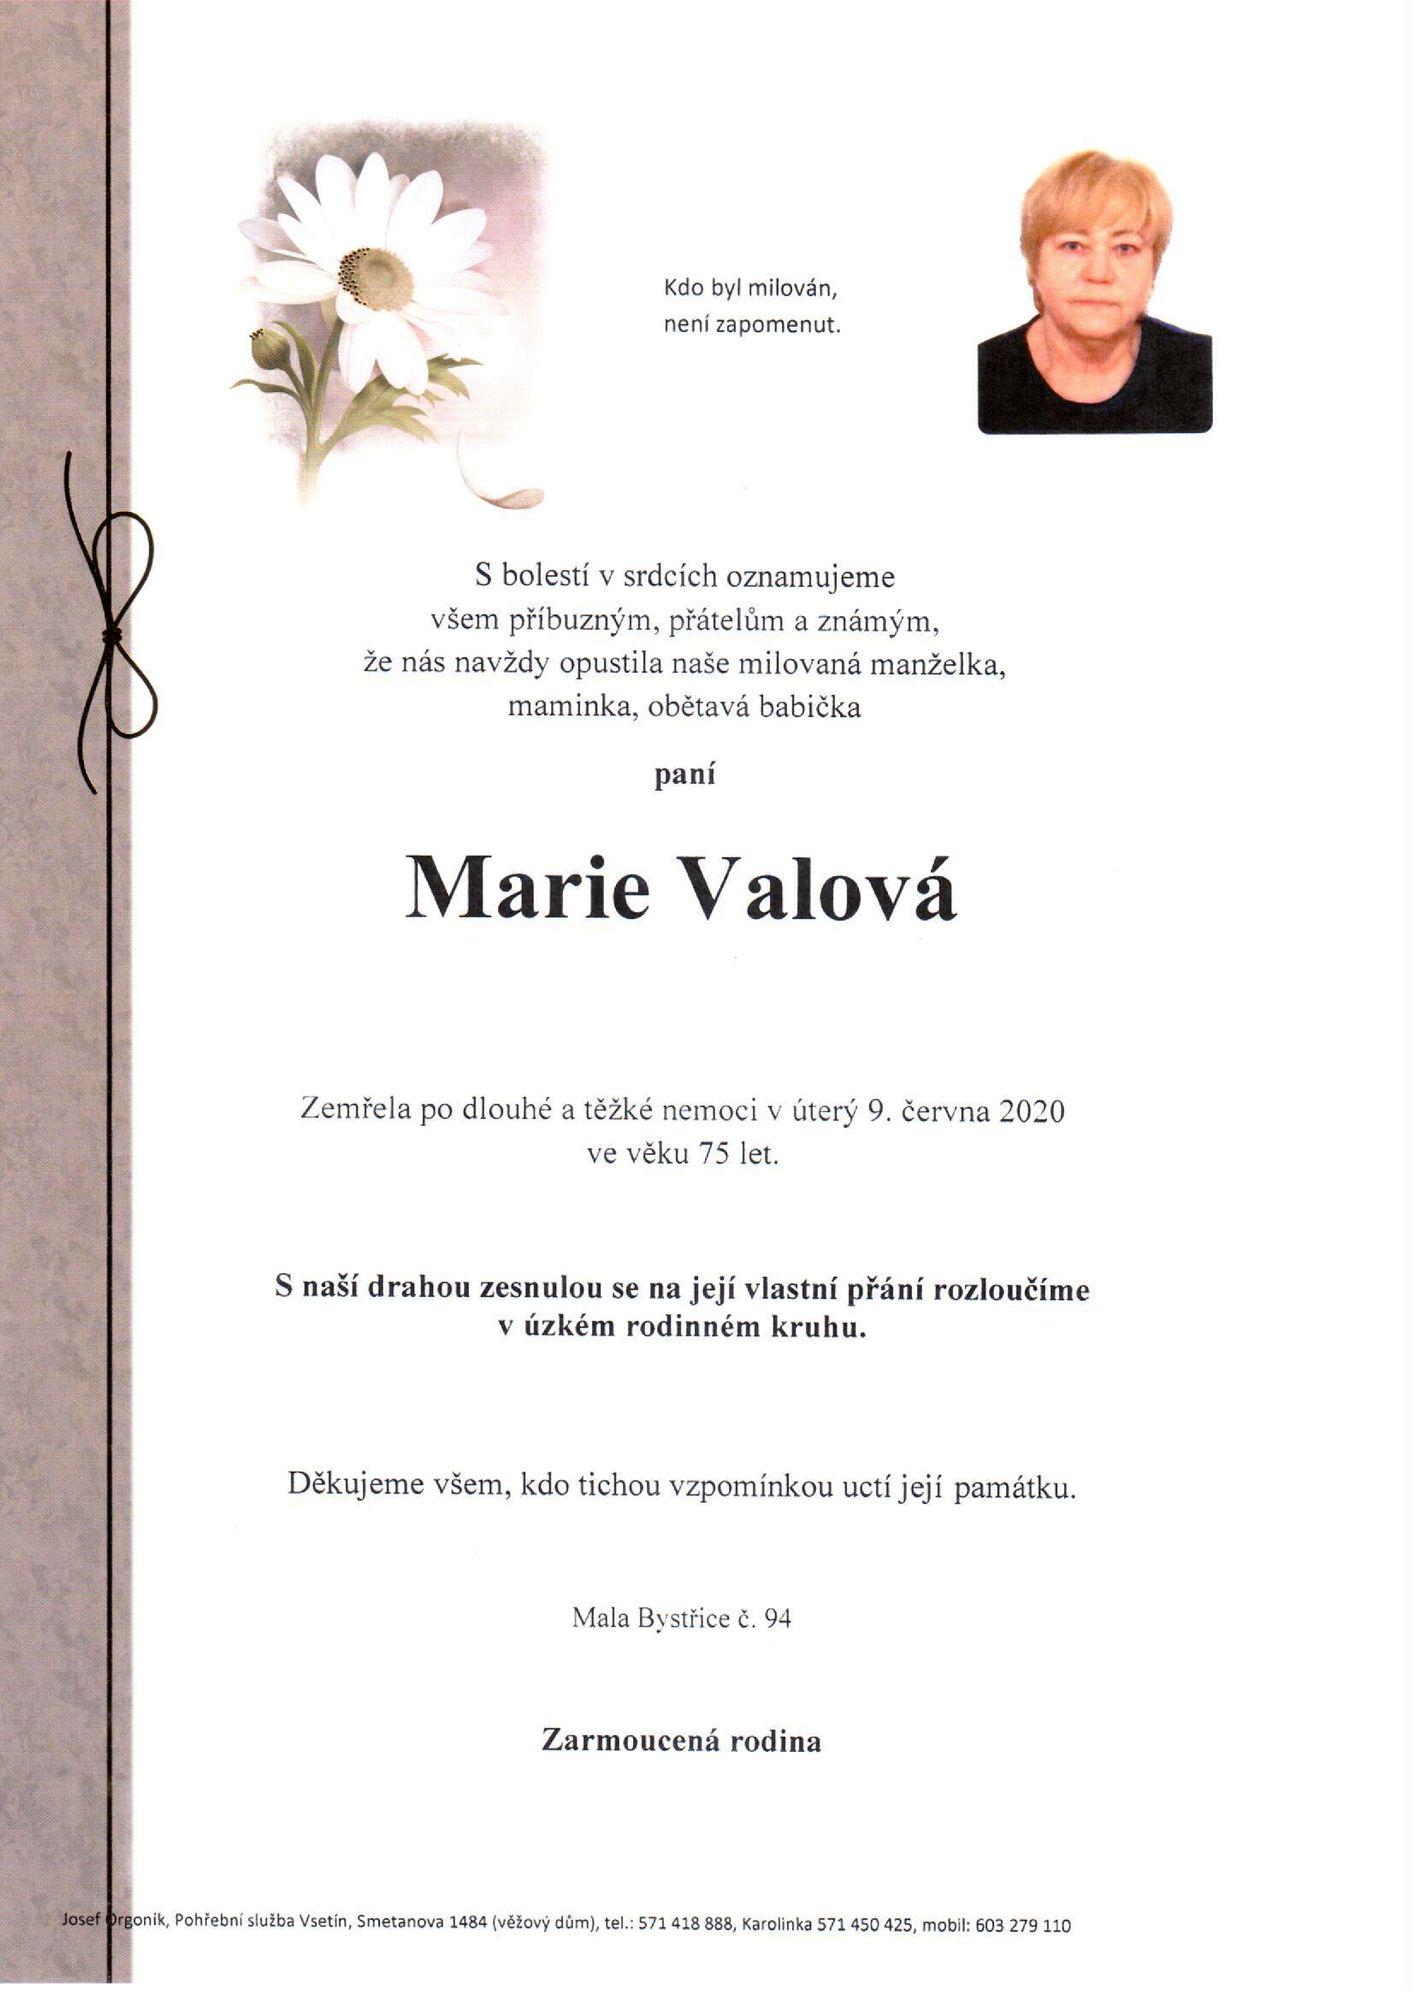 Marie Valová